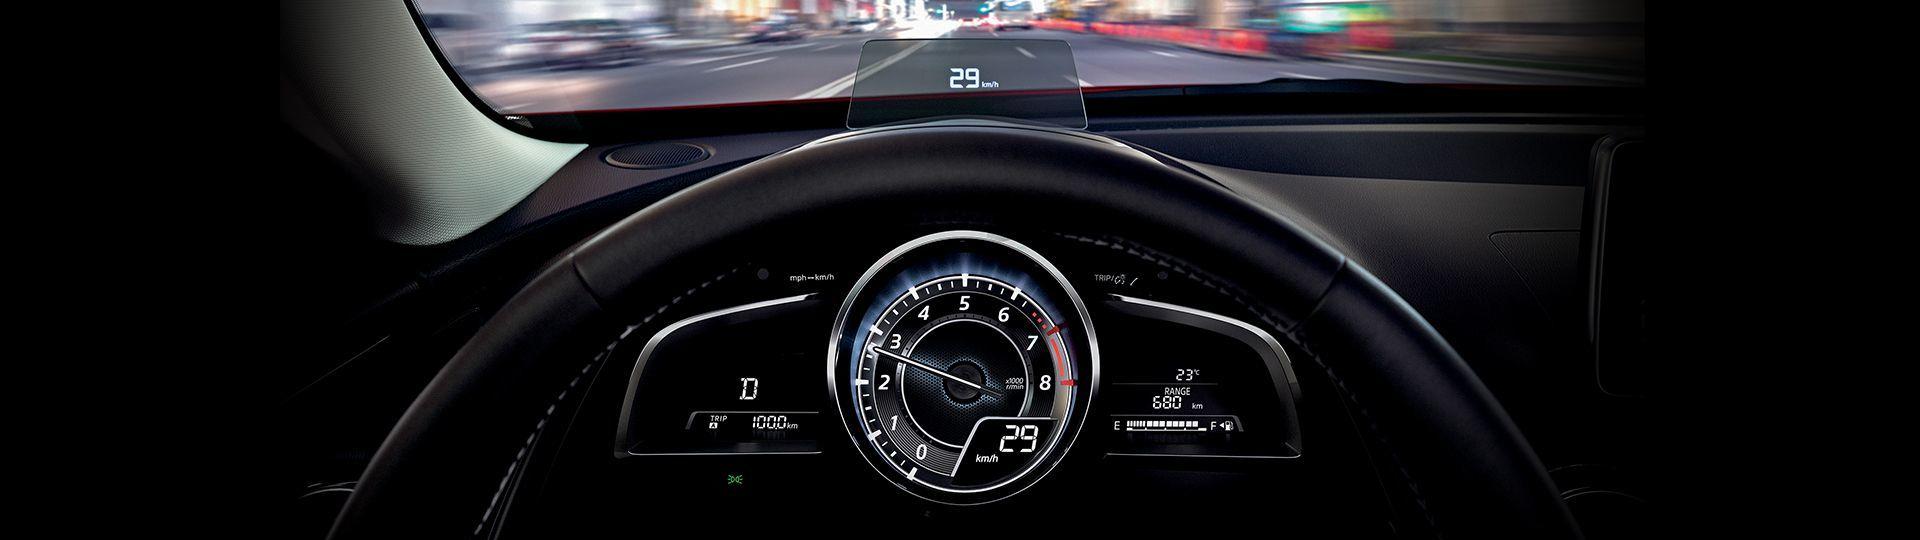 Mazda CX-3 tableau de bord